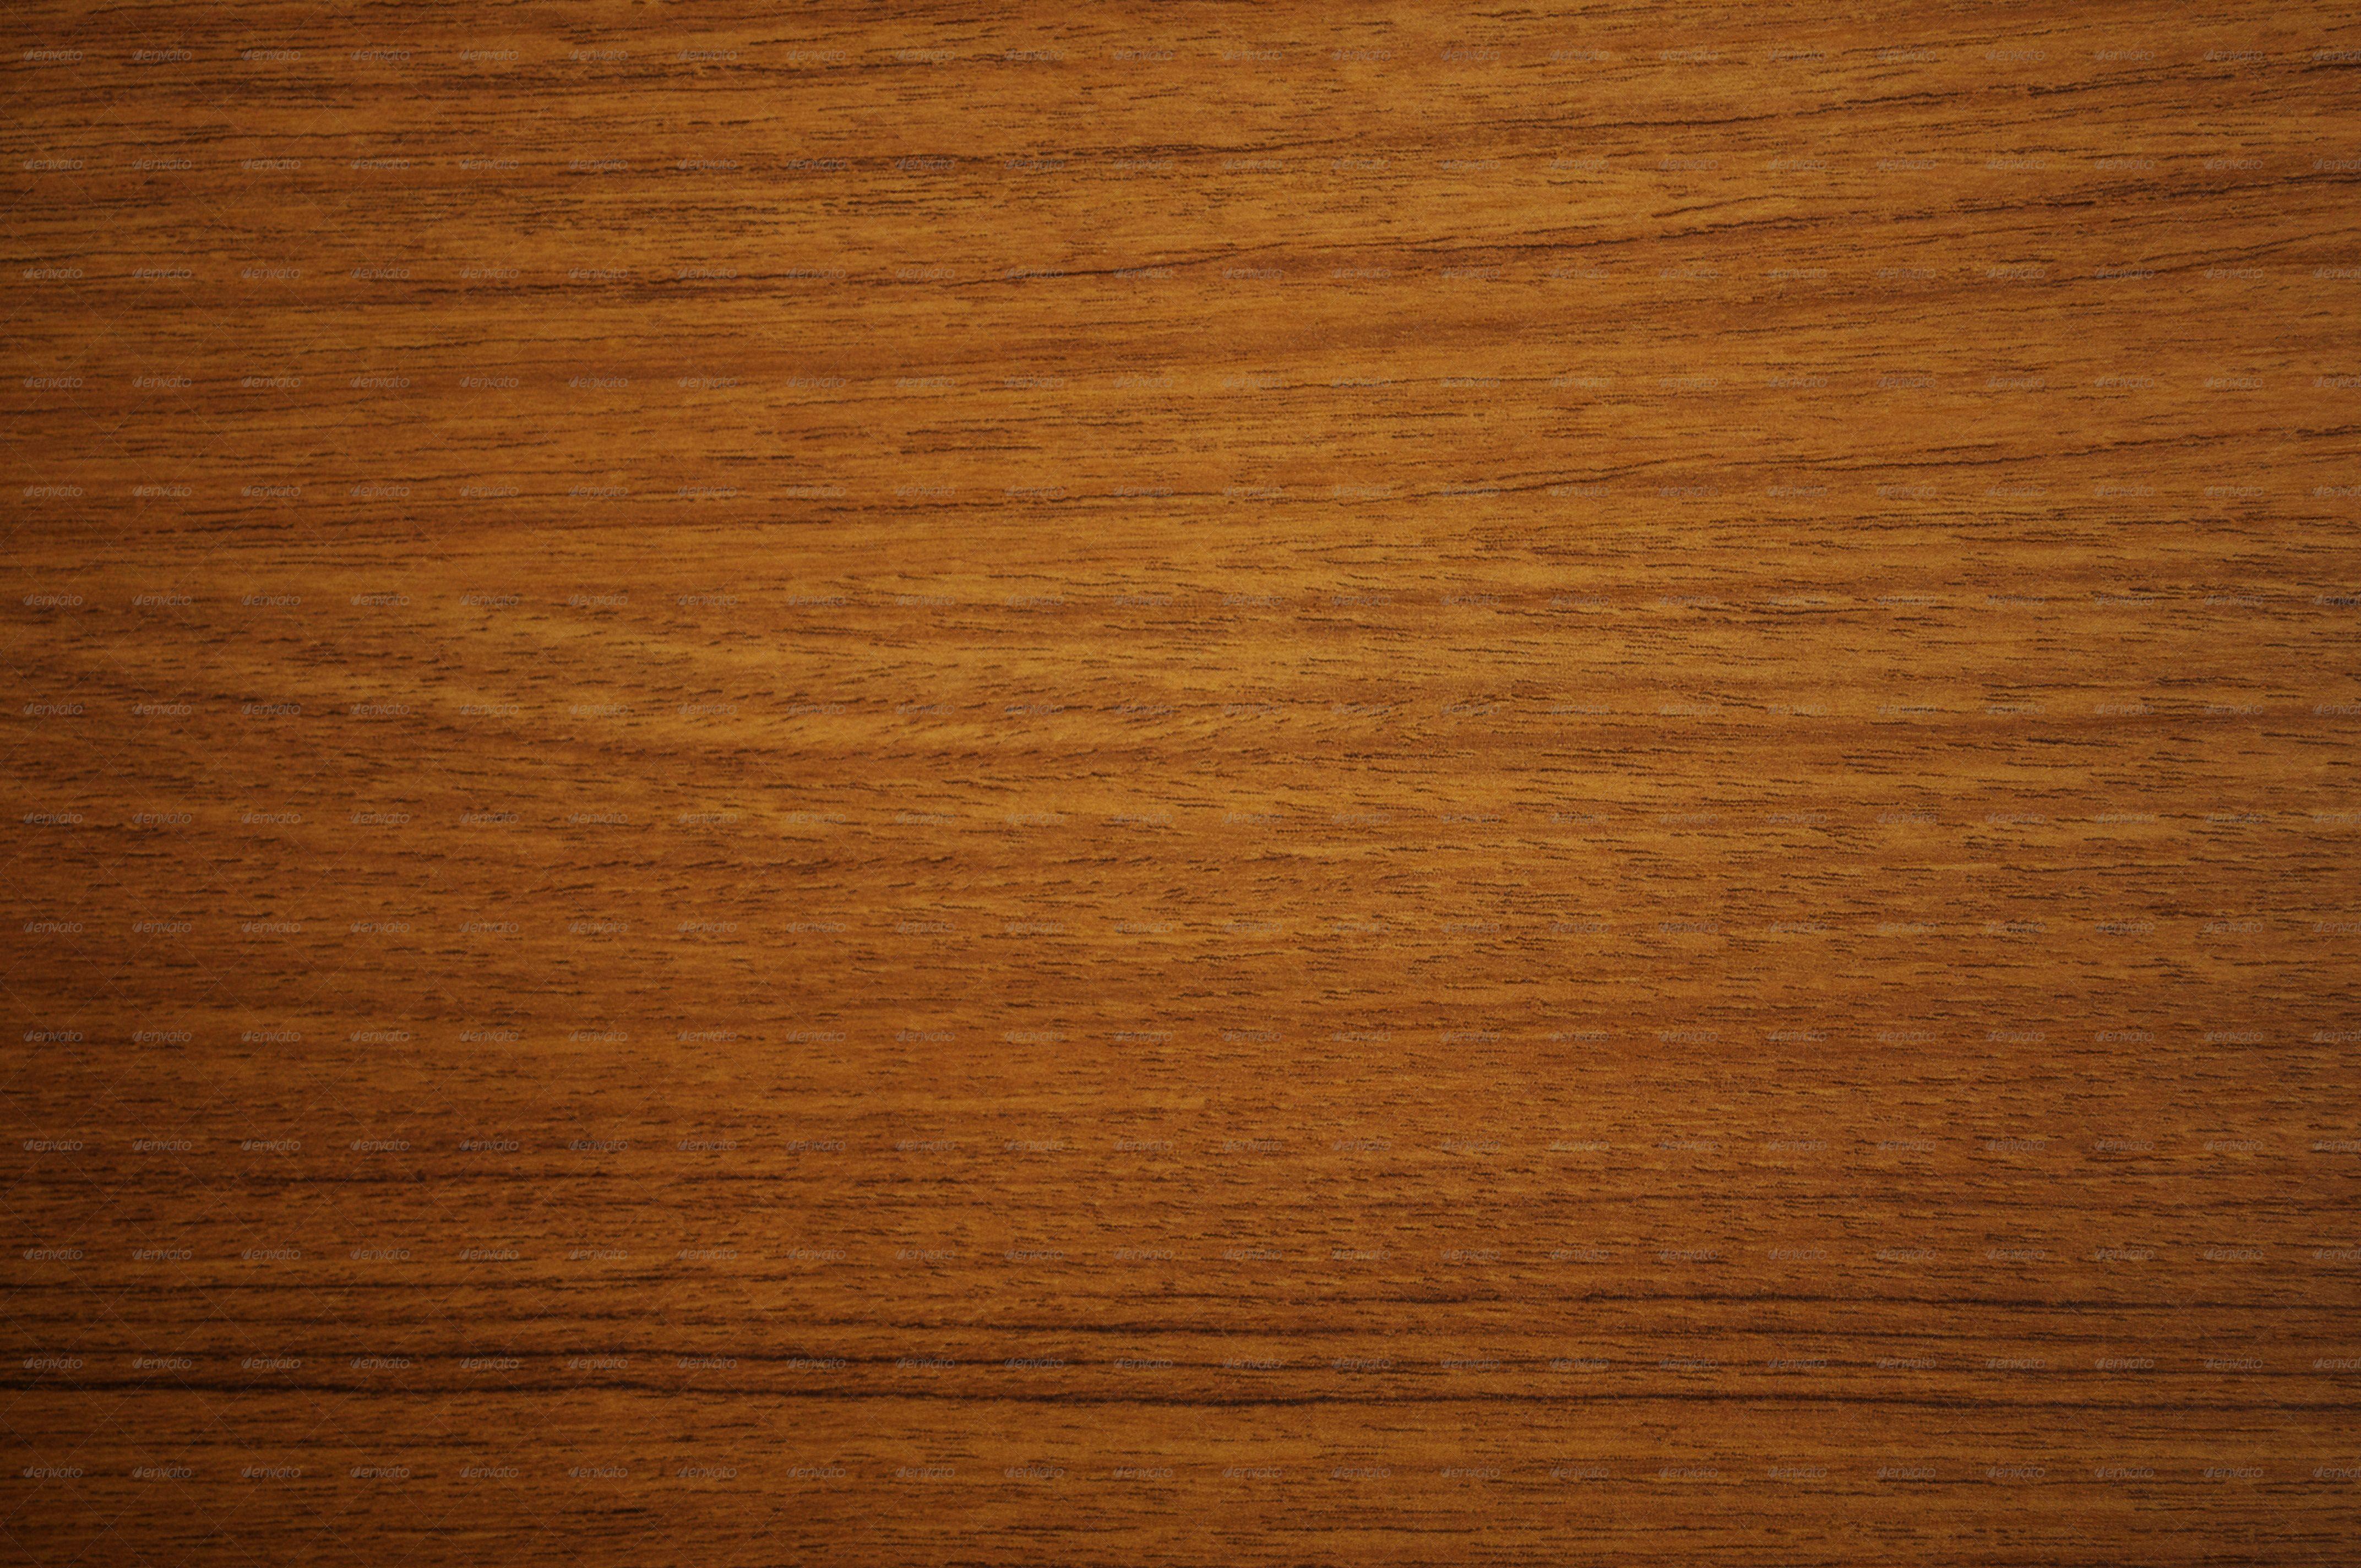 Dark wood table texture hd - Wood Texture Google